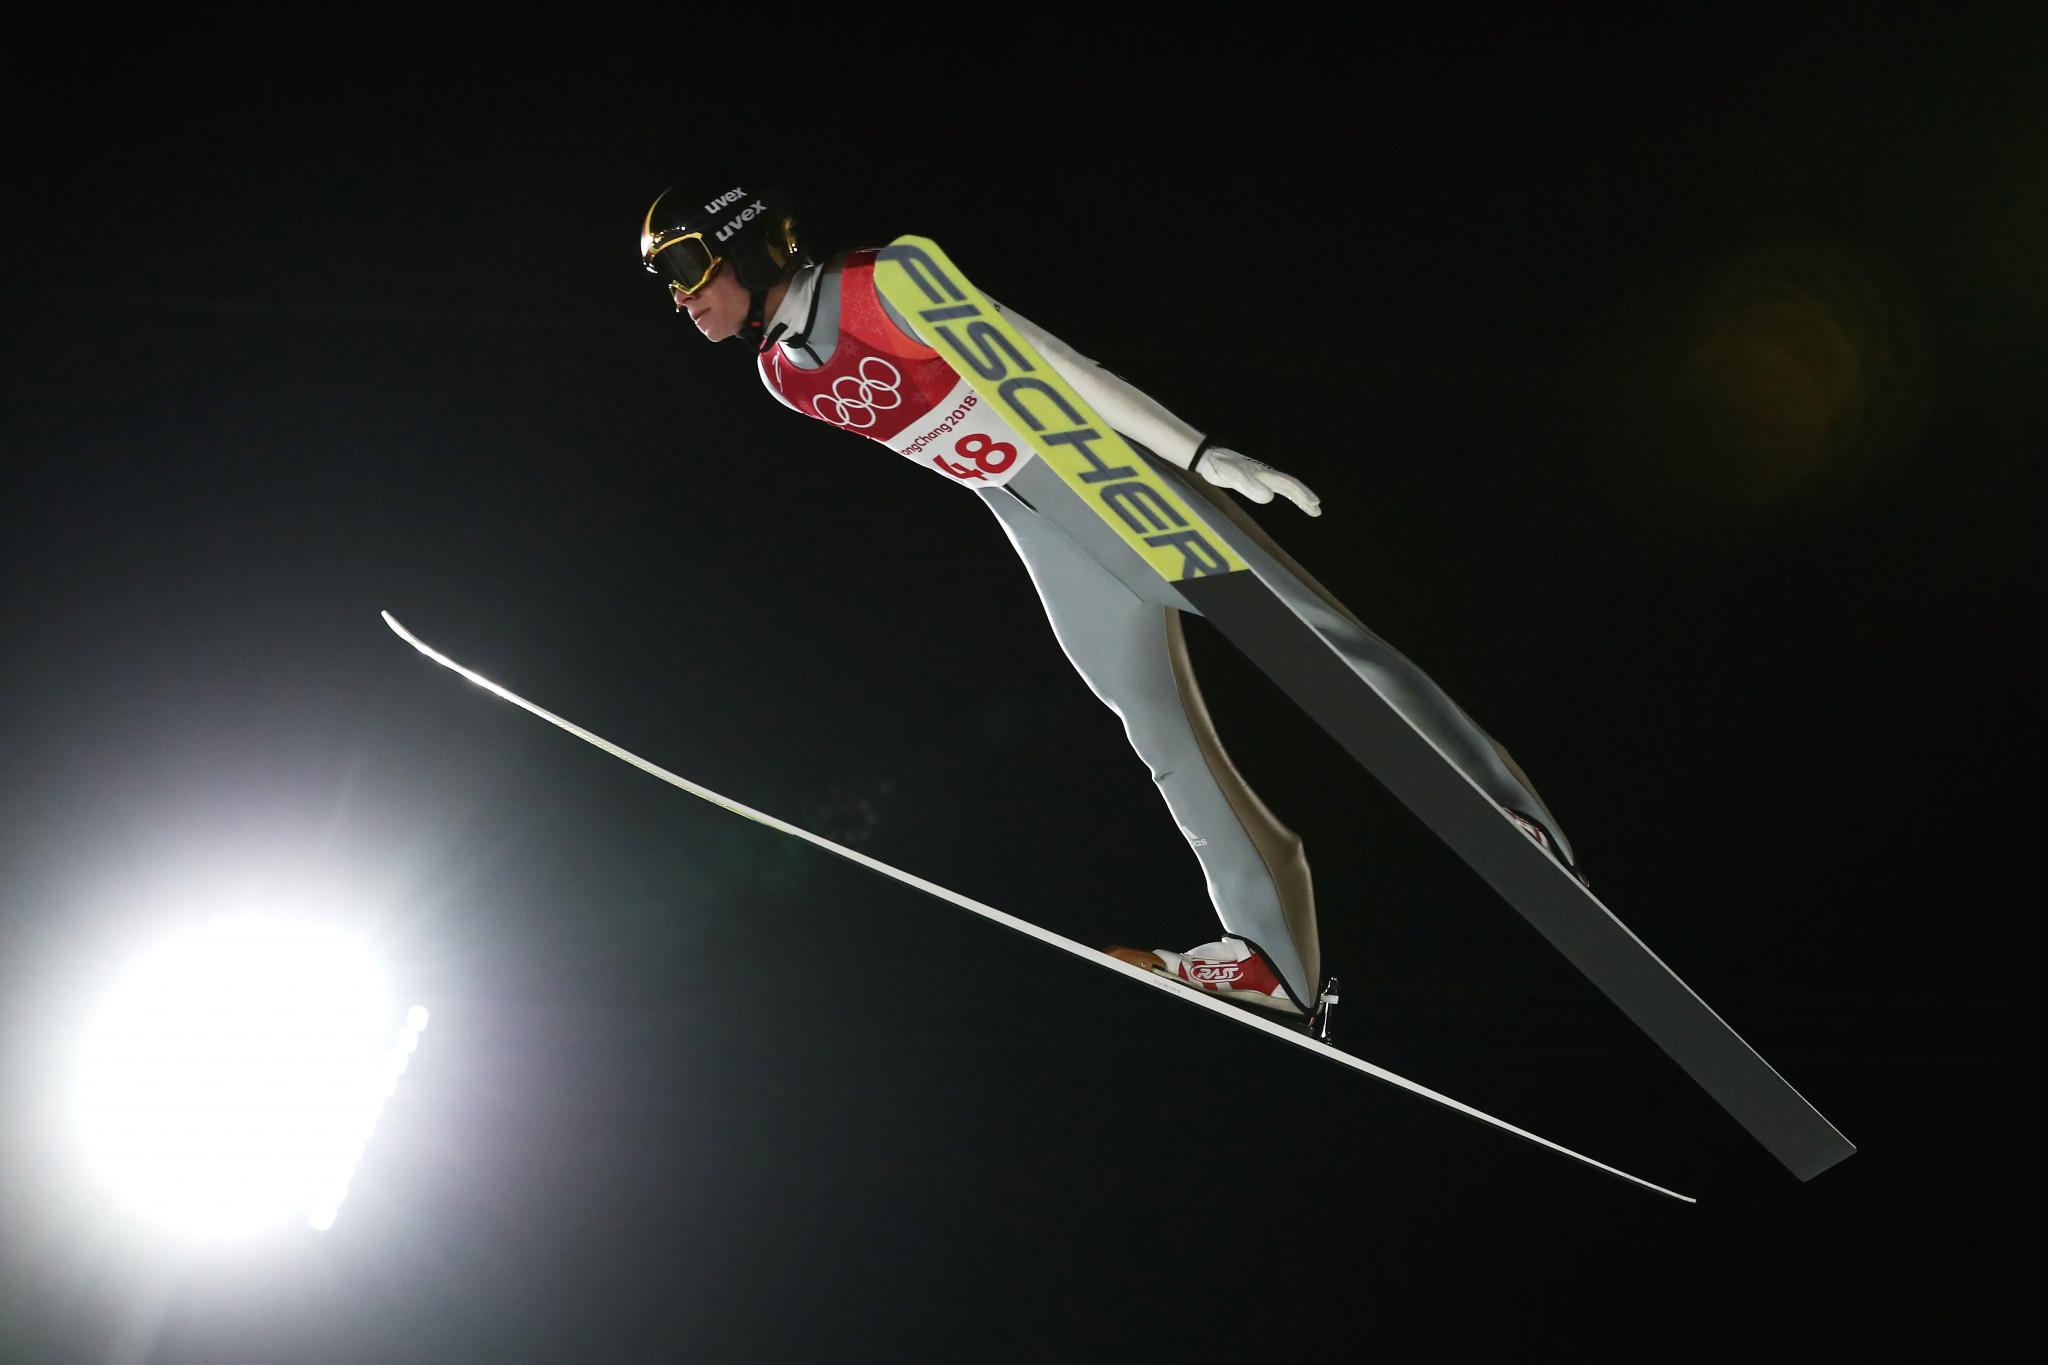 Wellinger to make return at season-opening FIS Ski Jumping World Cup leg in Wisla